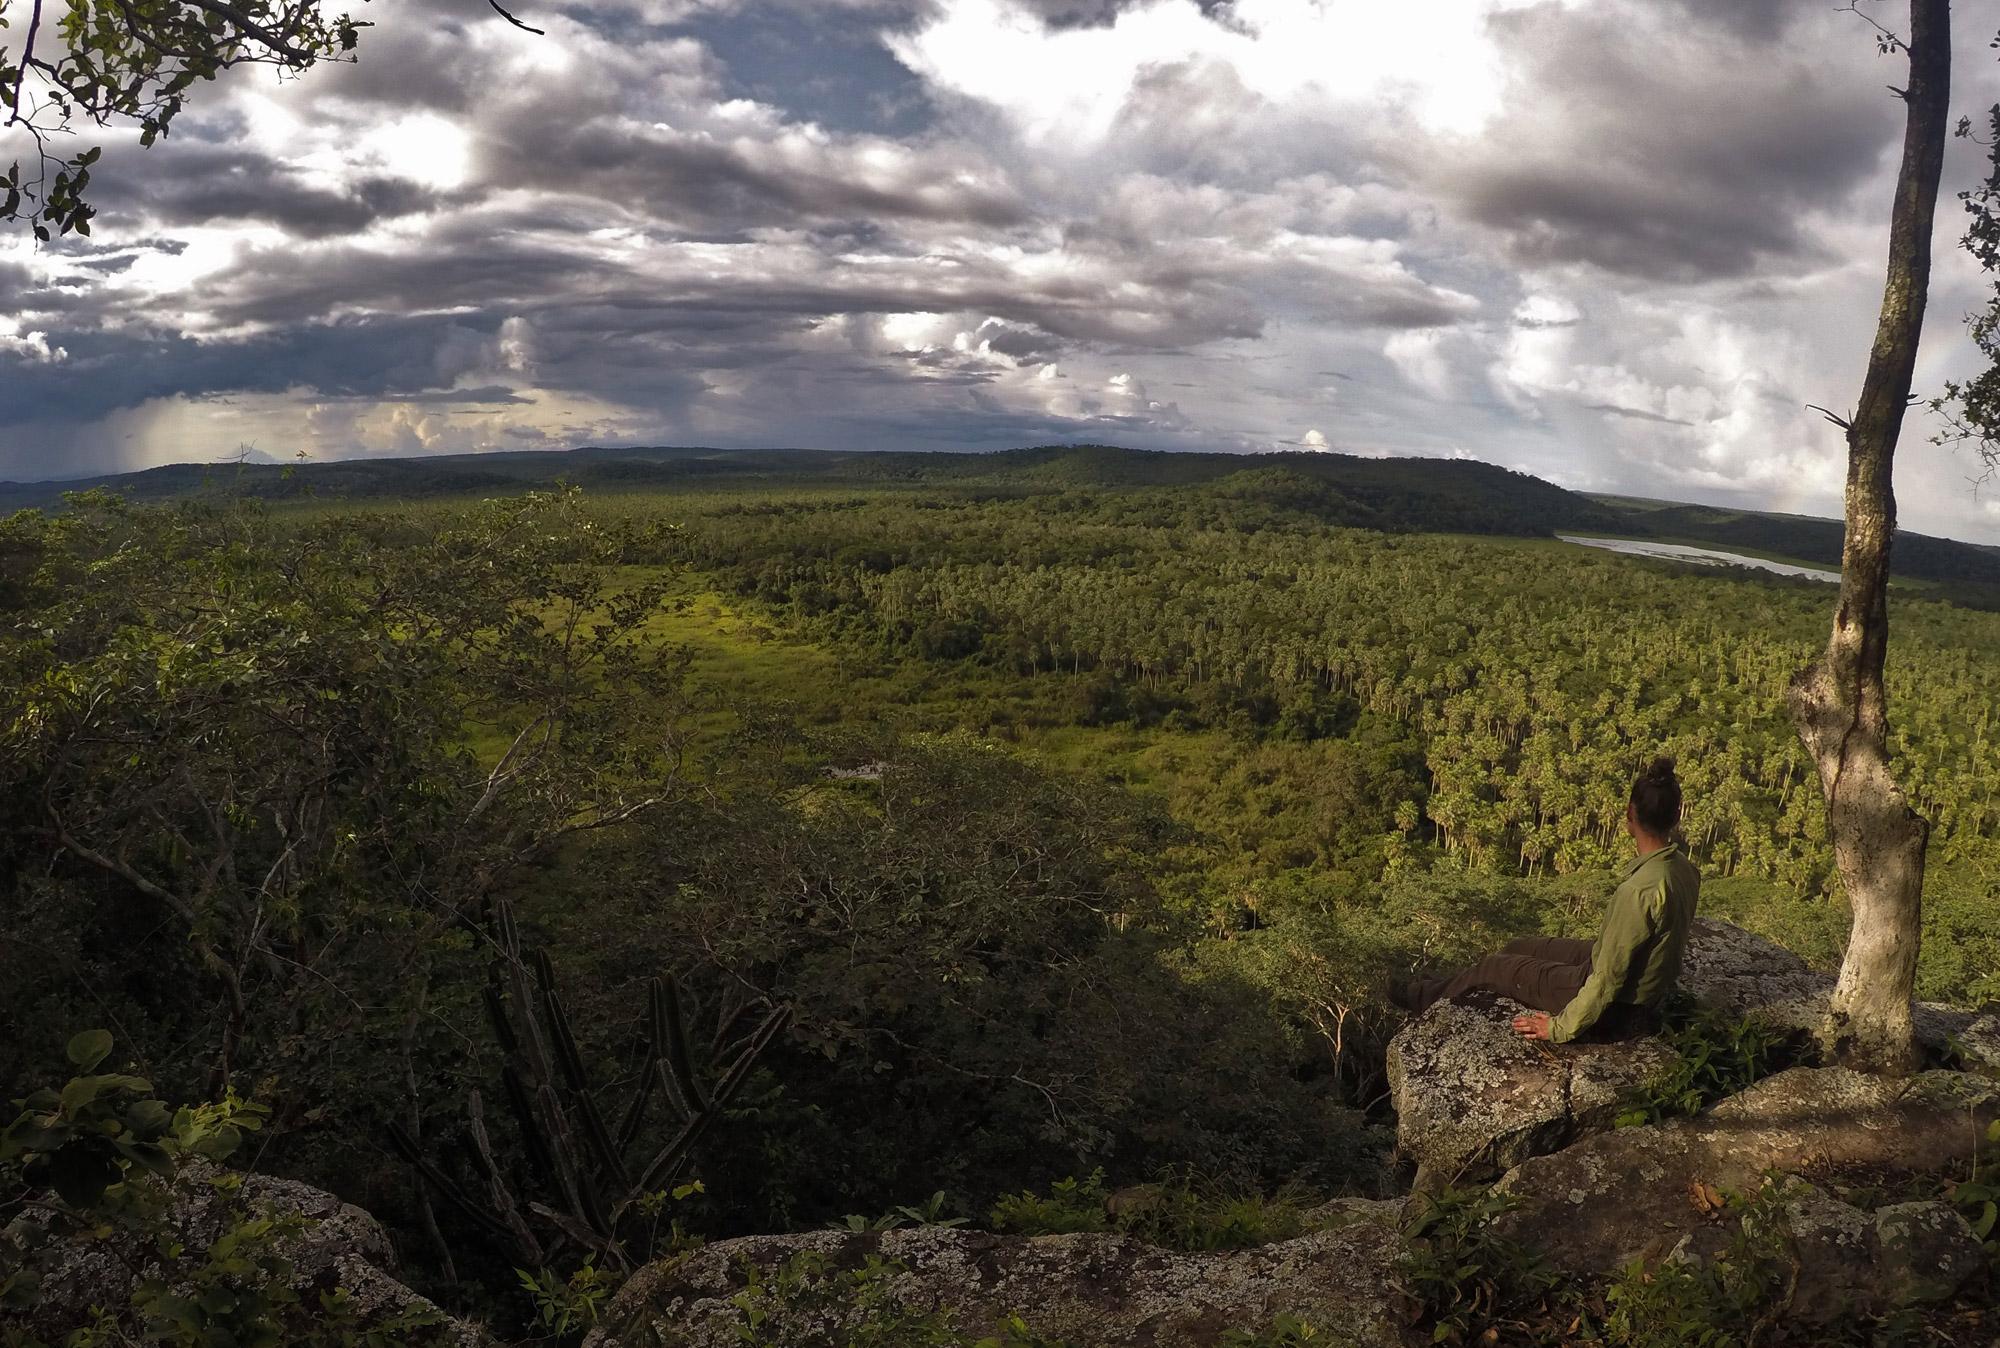 Beste plekken in Bolivia om wildlife te spotten: San Miguelito Jaguar Range